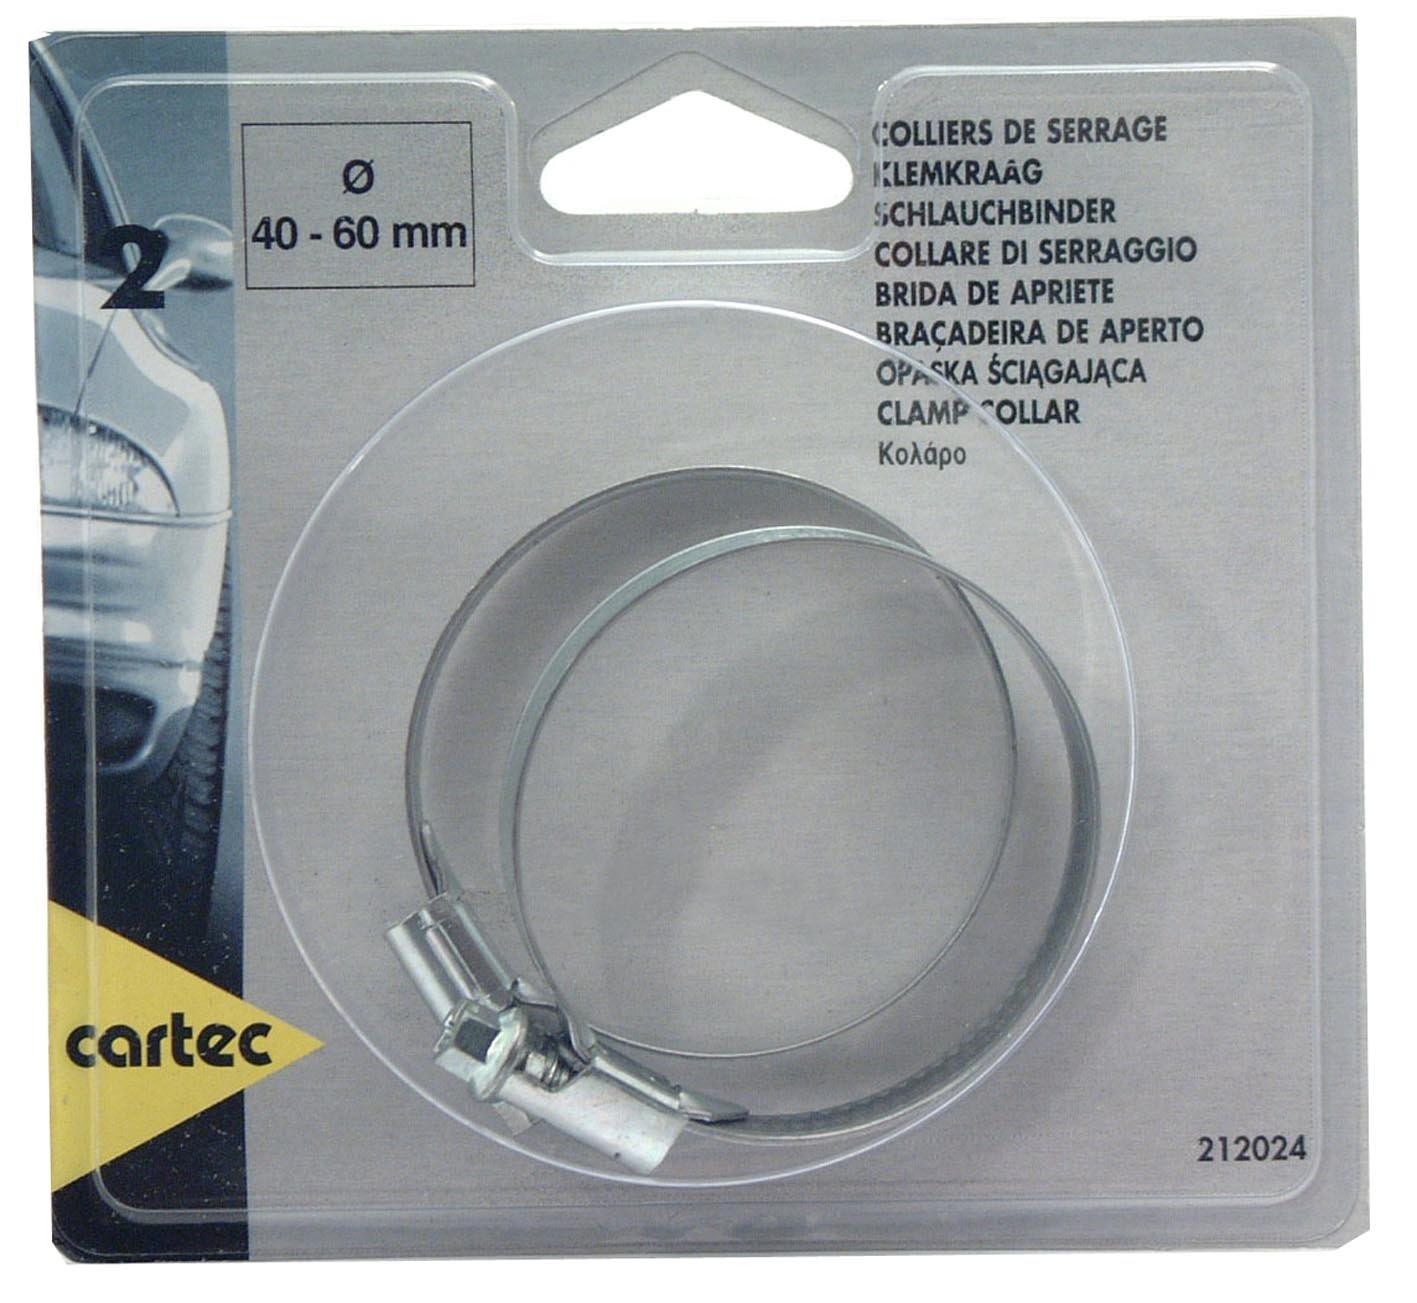 Cartec 212024 2 Colliers de Serrage 40-60 mm